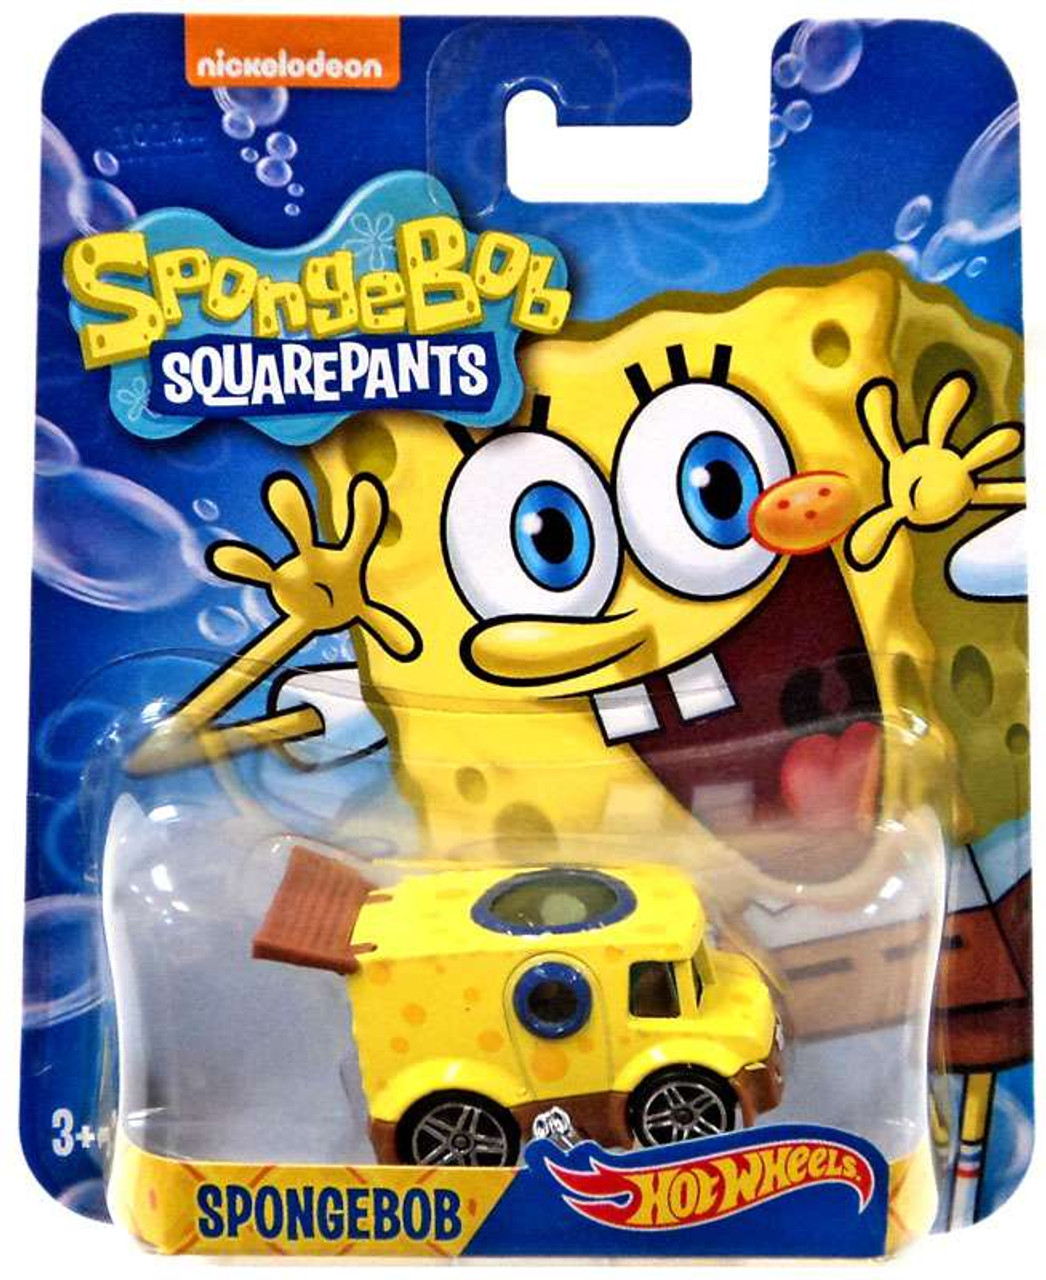 SpongeBob Hot Wheels Nickelodeon Spongebob Squarepants